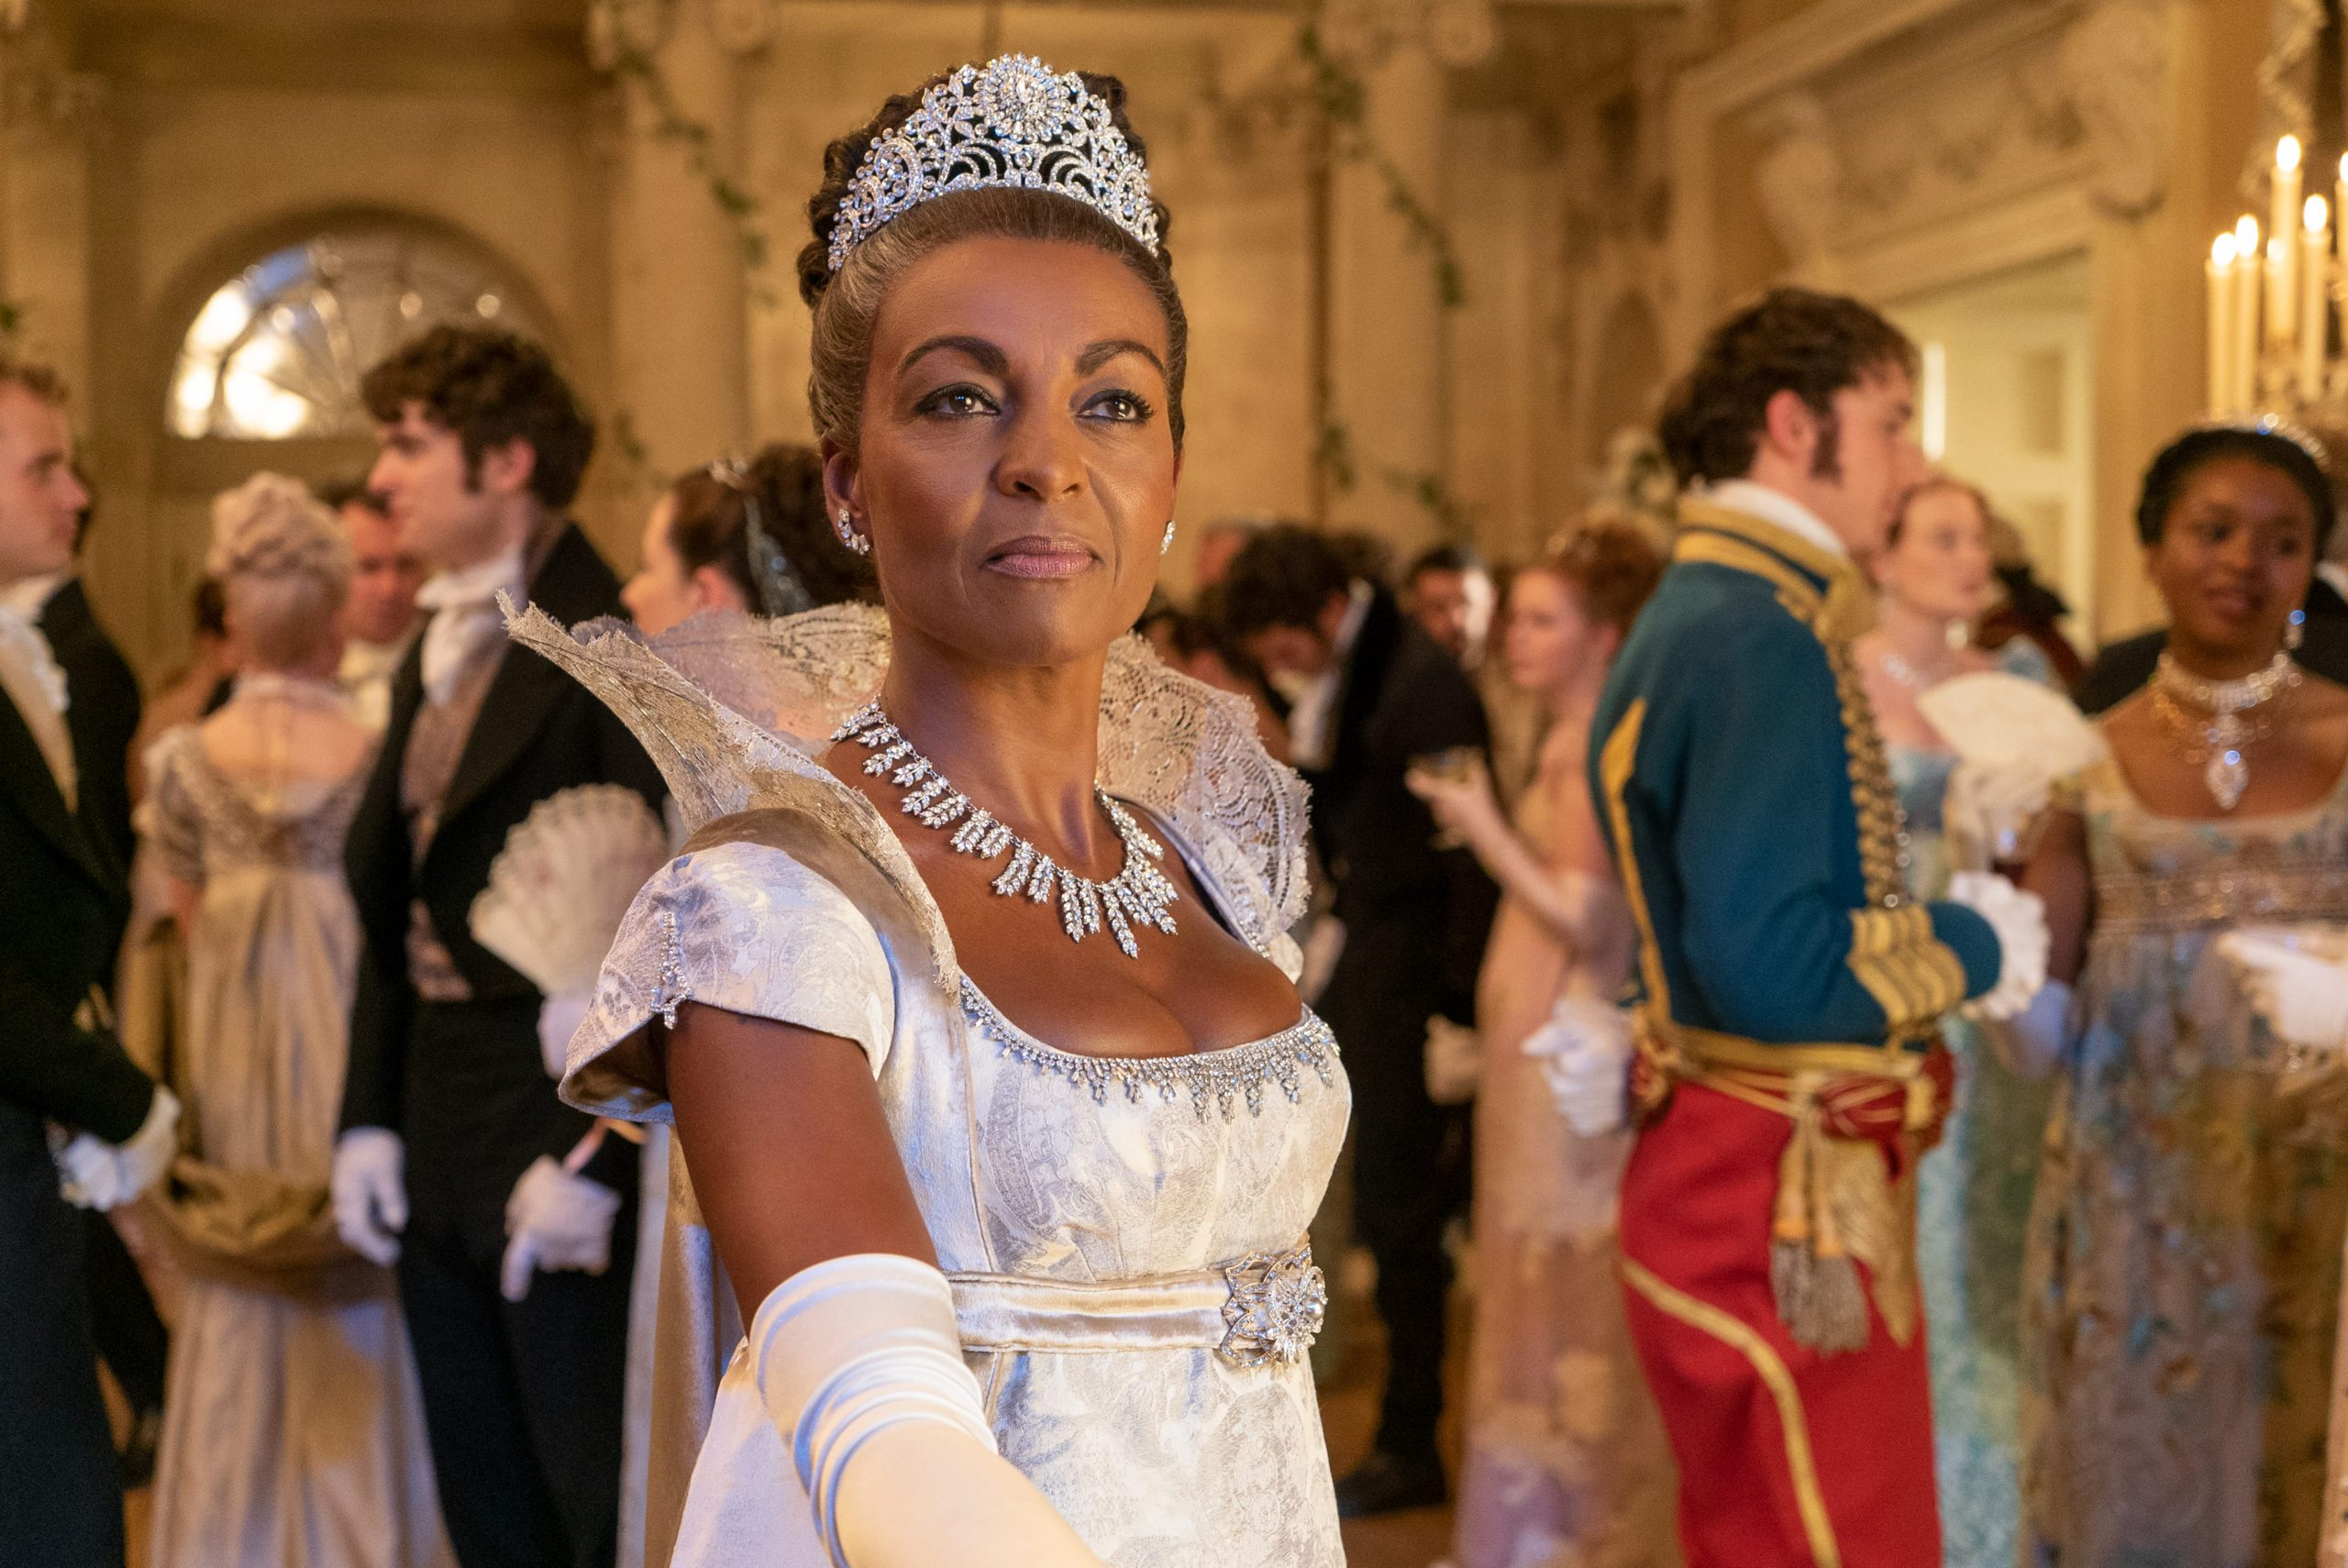 Lady Danbury in the Netflix show, Bridgerton